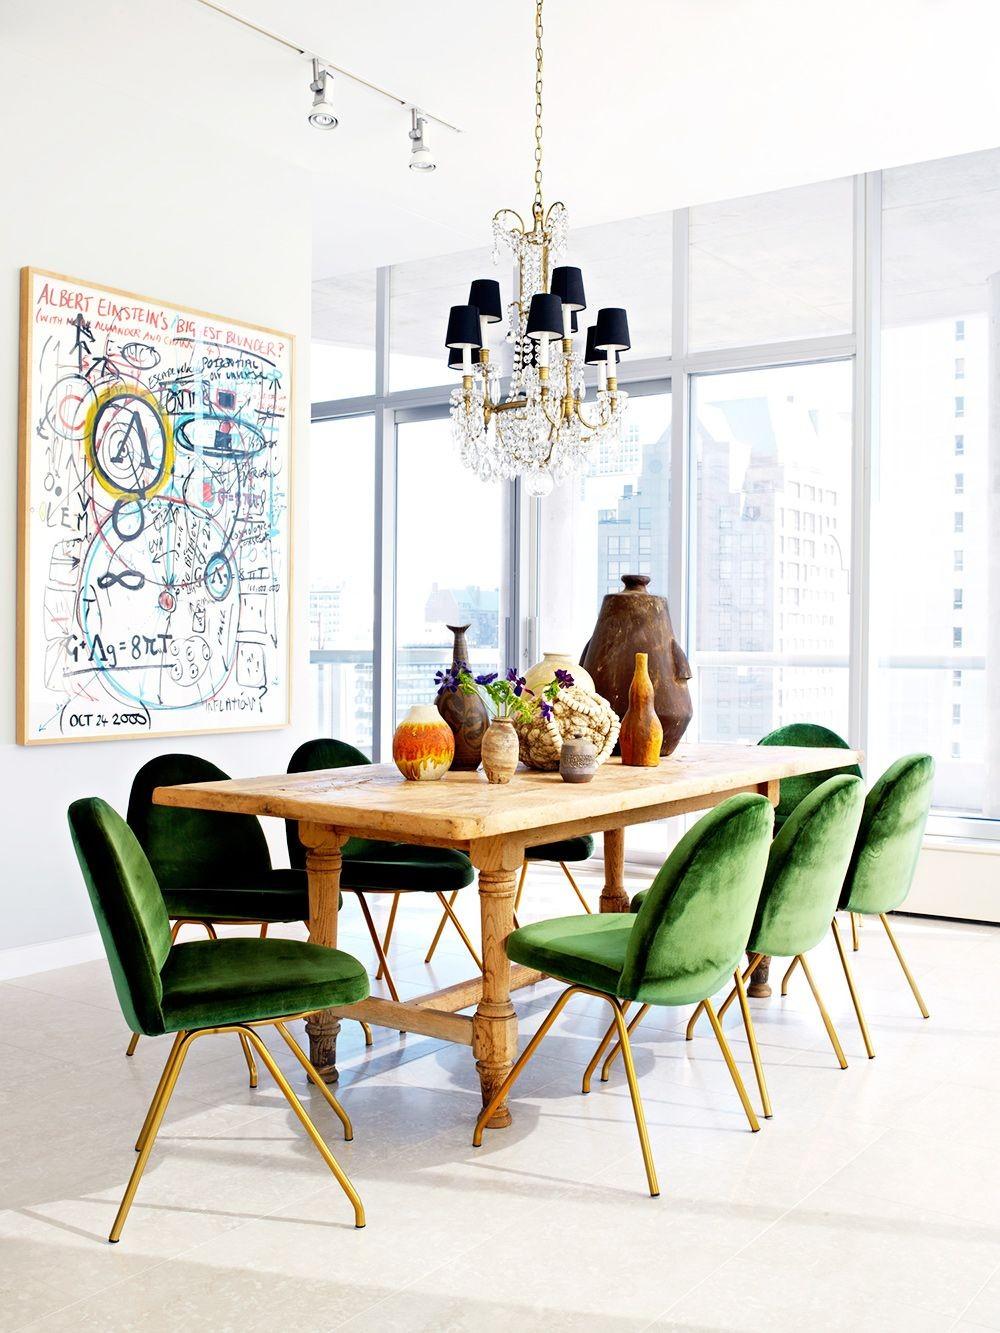 nate berkus Dining Room Projects by Nate Berkus 1 Pinterest